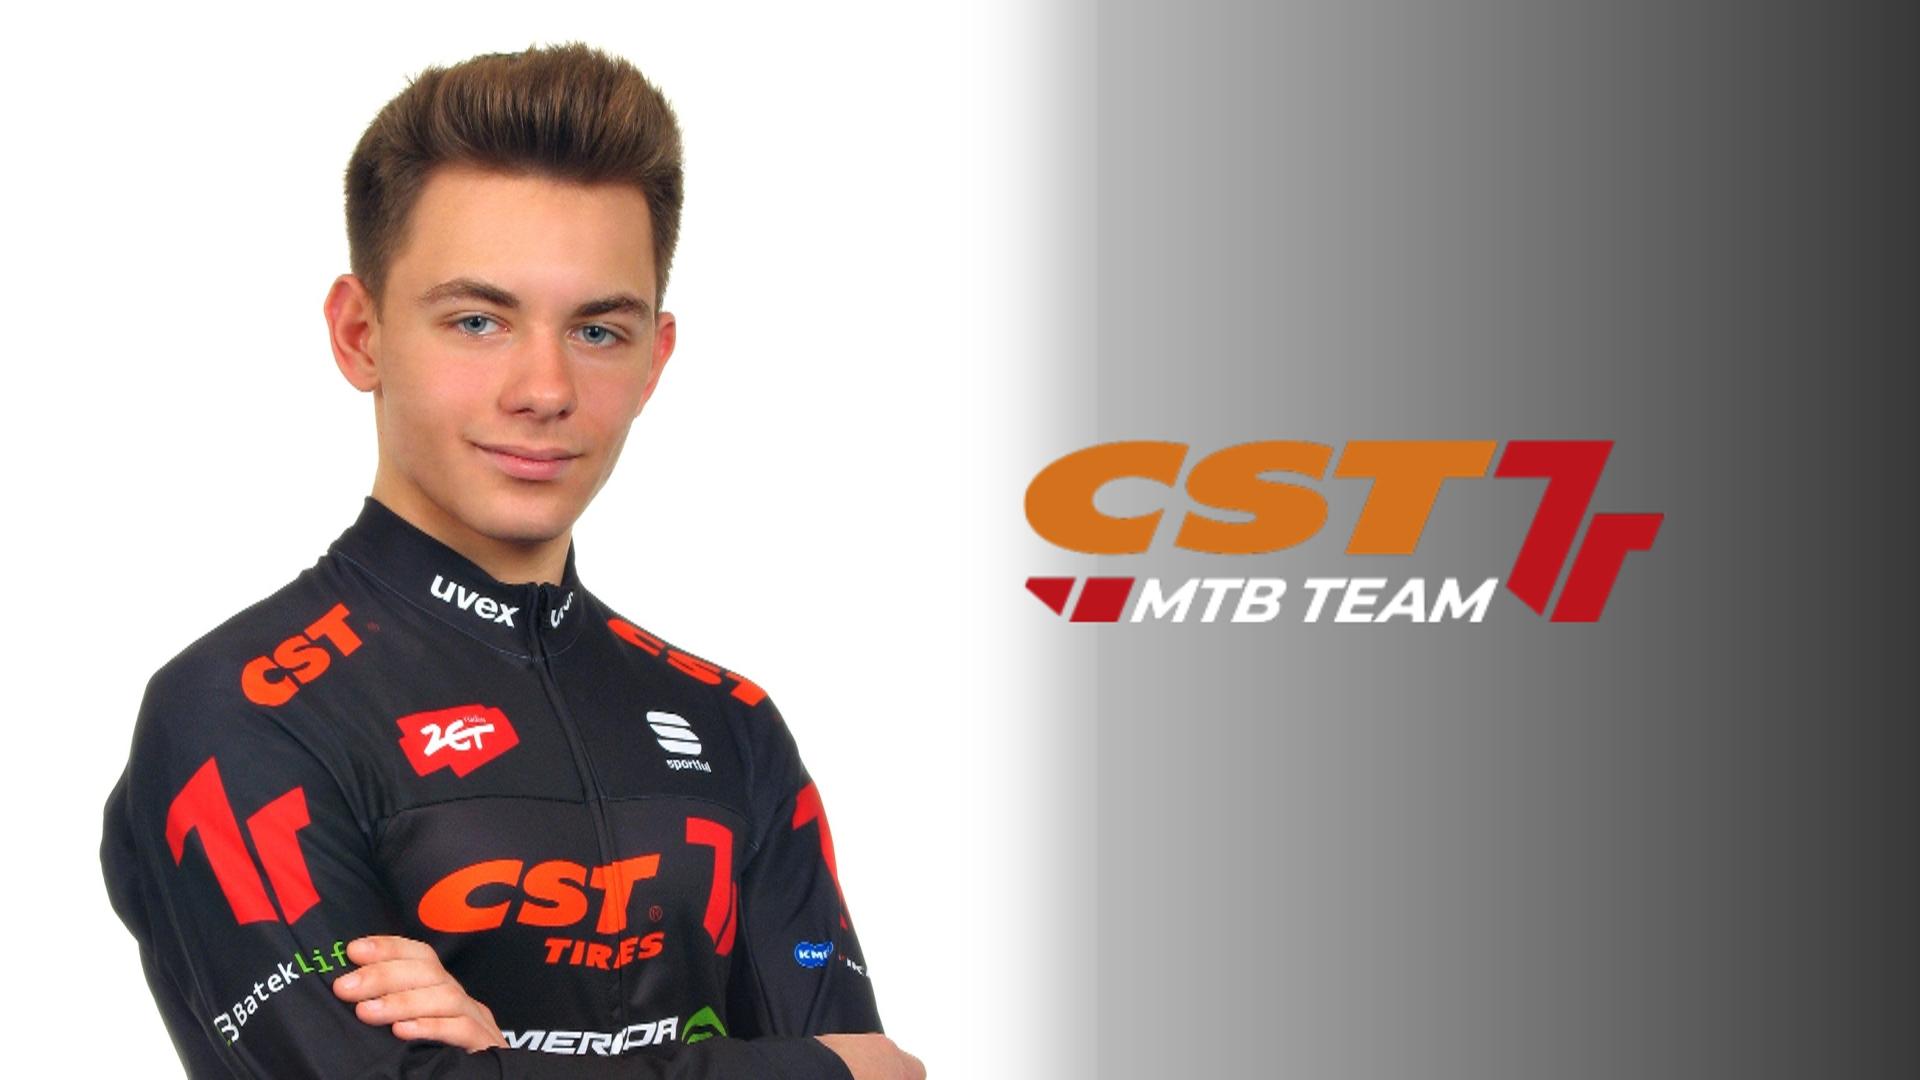 Oliwier Machura nowym zawodnikiem CST 7R MTB Team